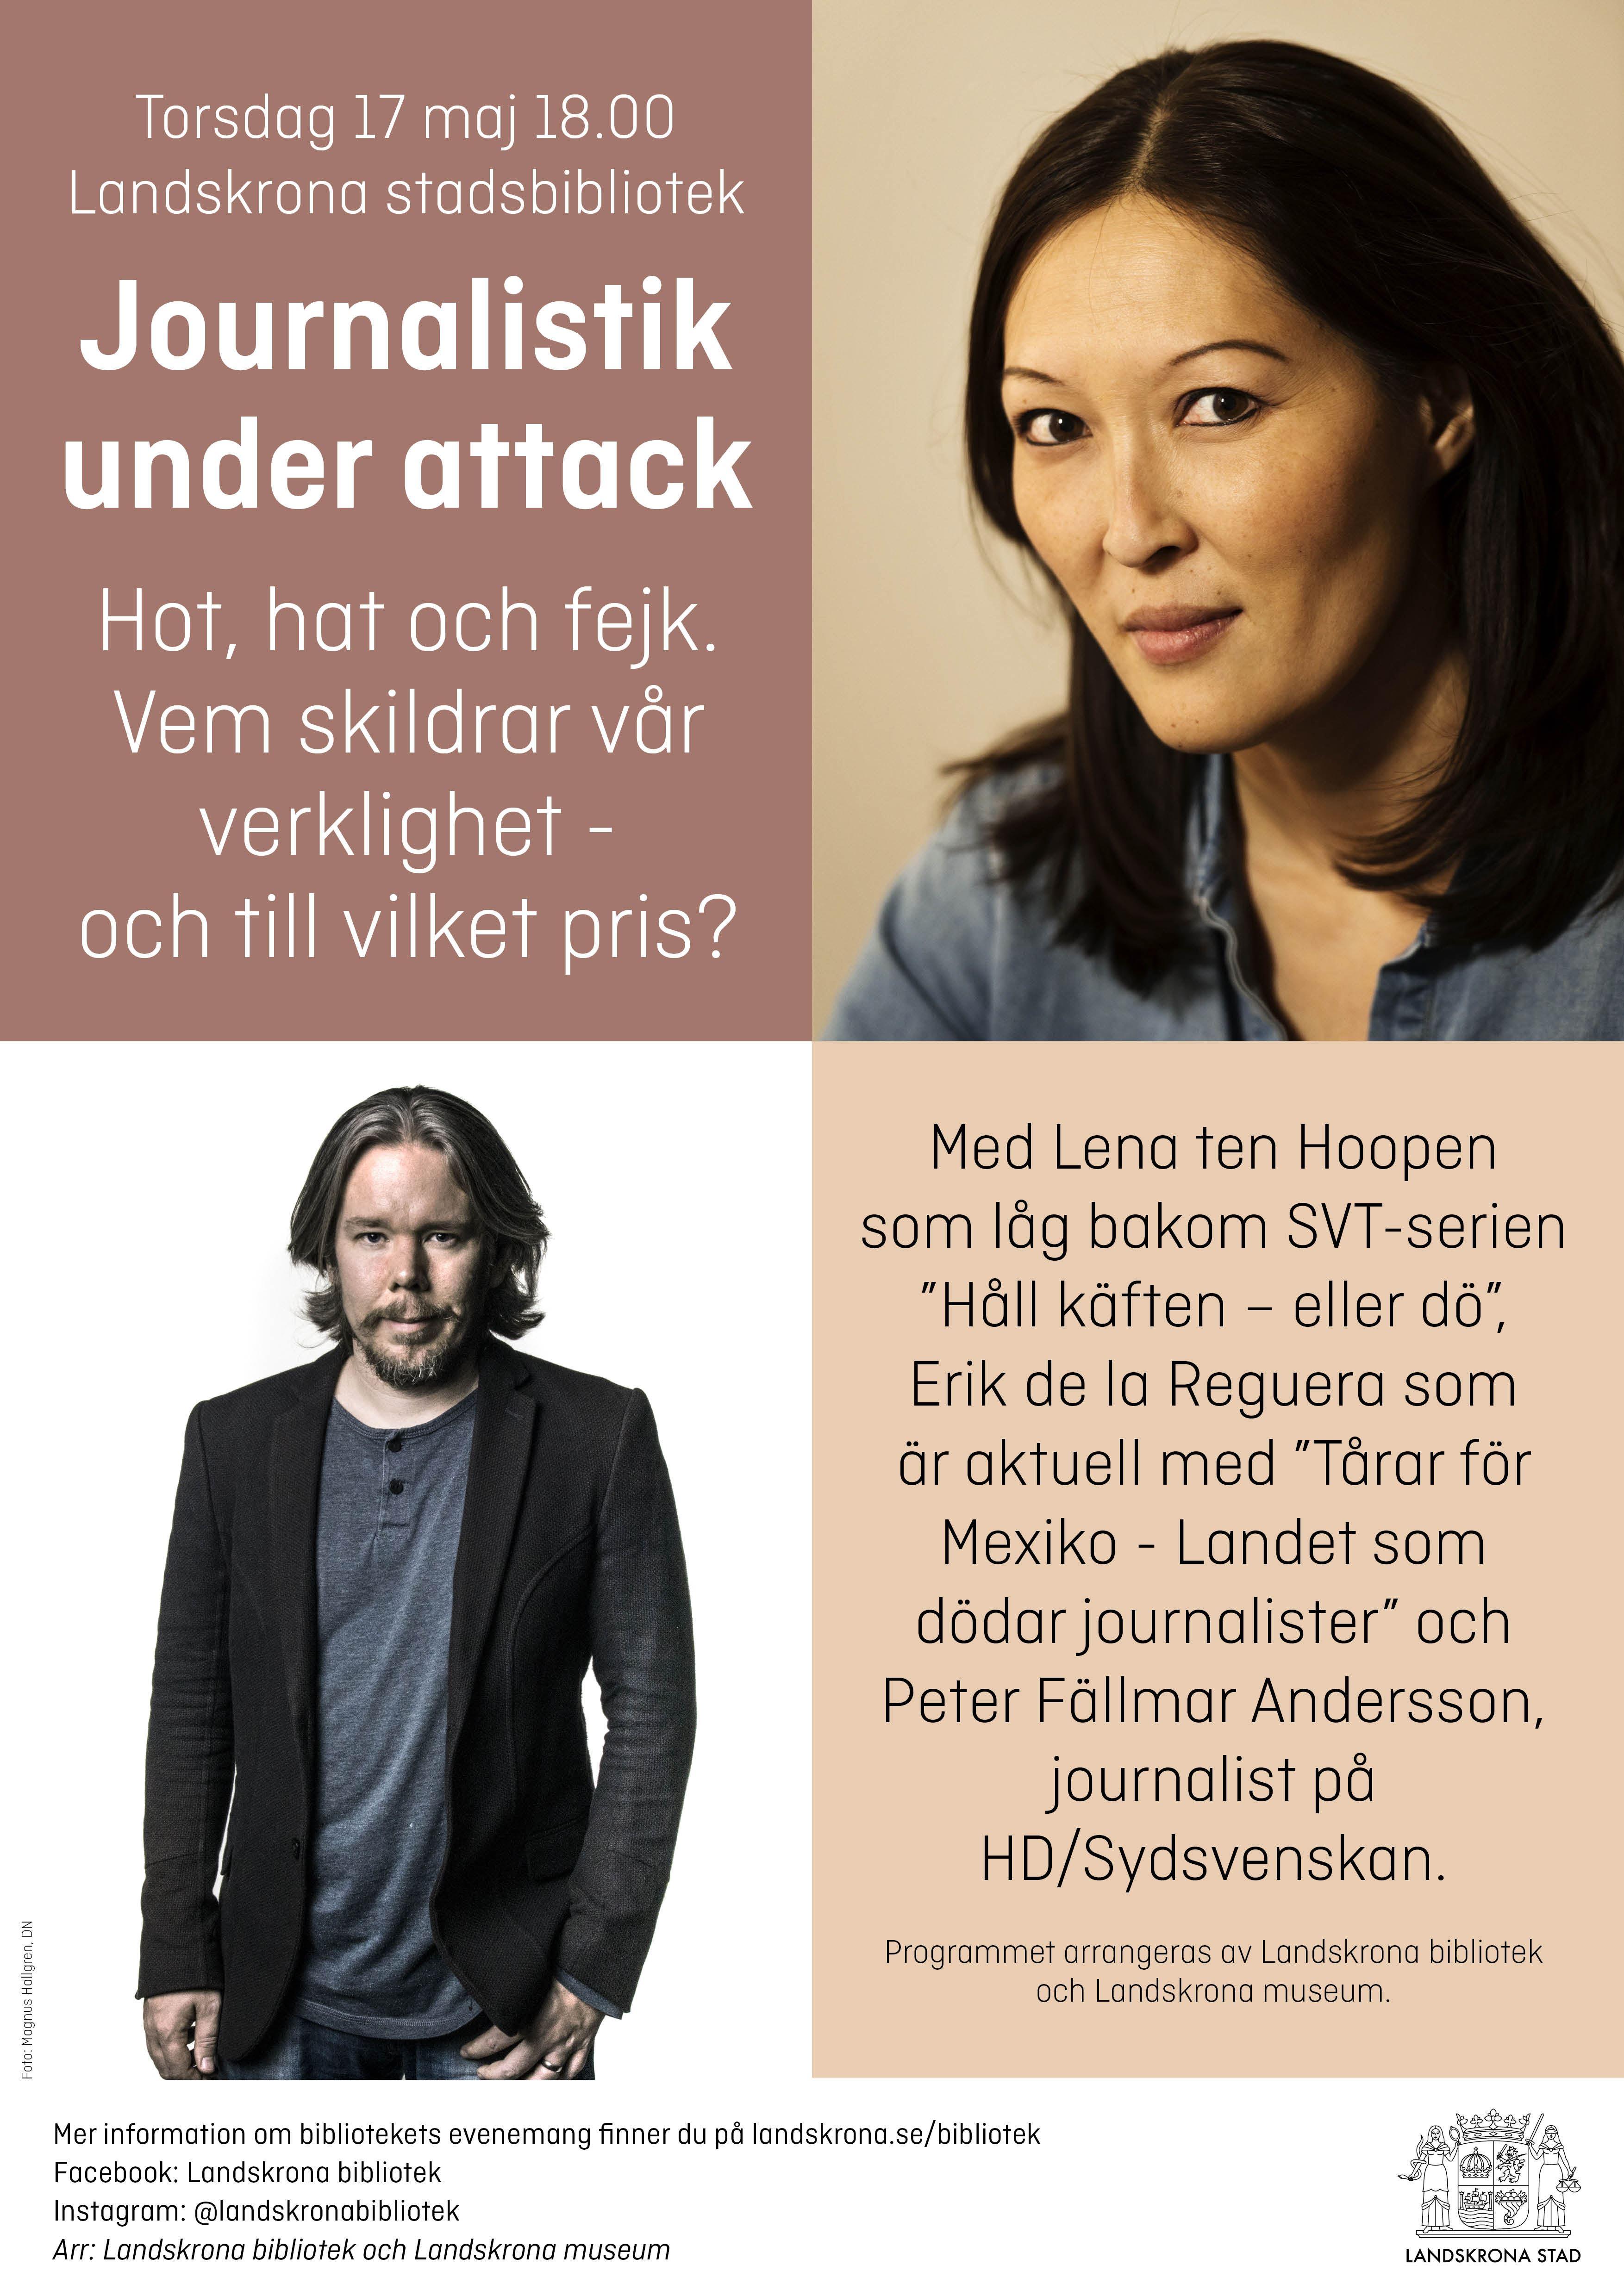 Ola Kjelbye, Magnus Hallgren, Journalistik under attack - Lena Ten Hoopen, Erik de la Reguera och Peter Fällmar Andersson